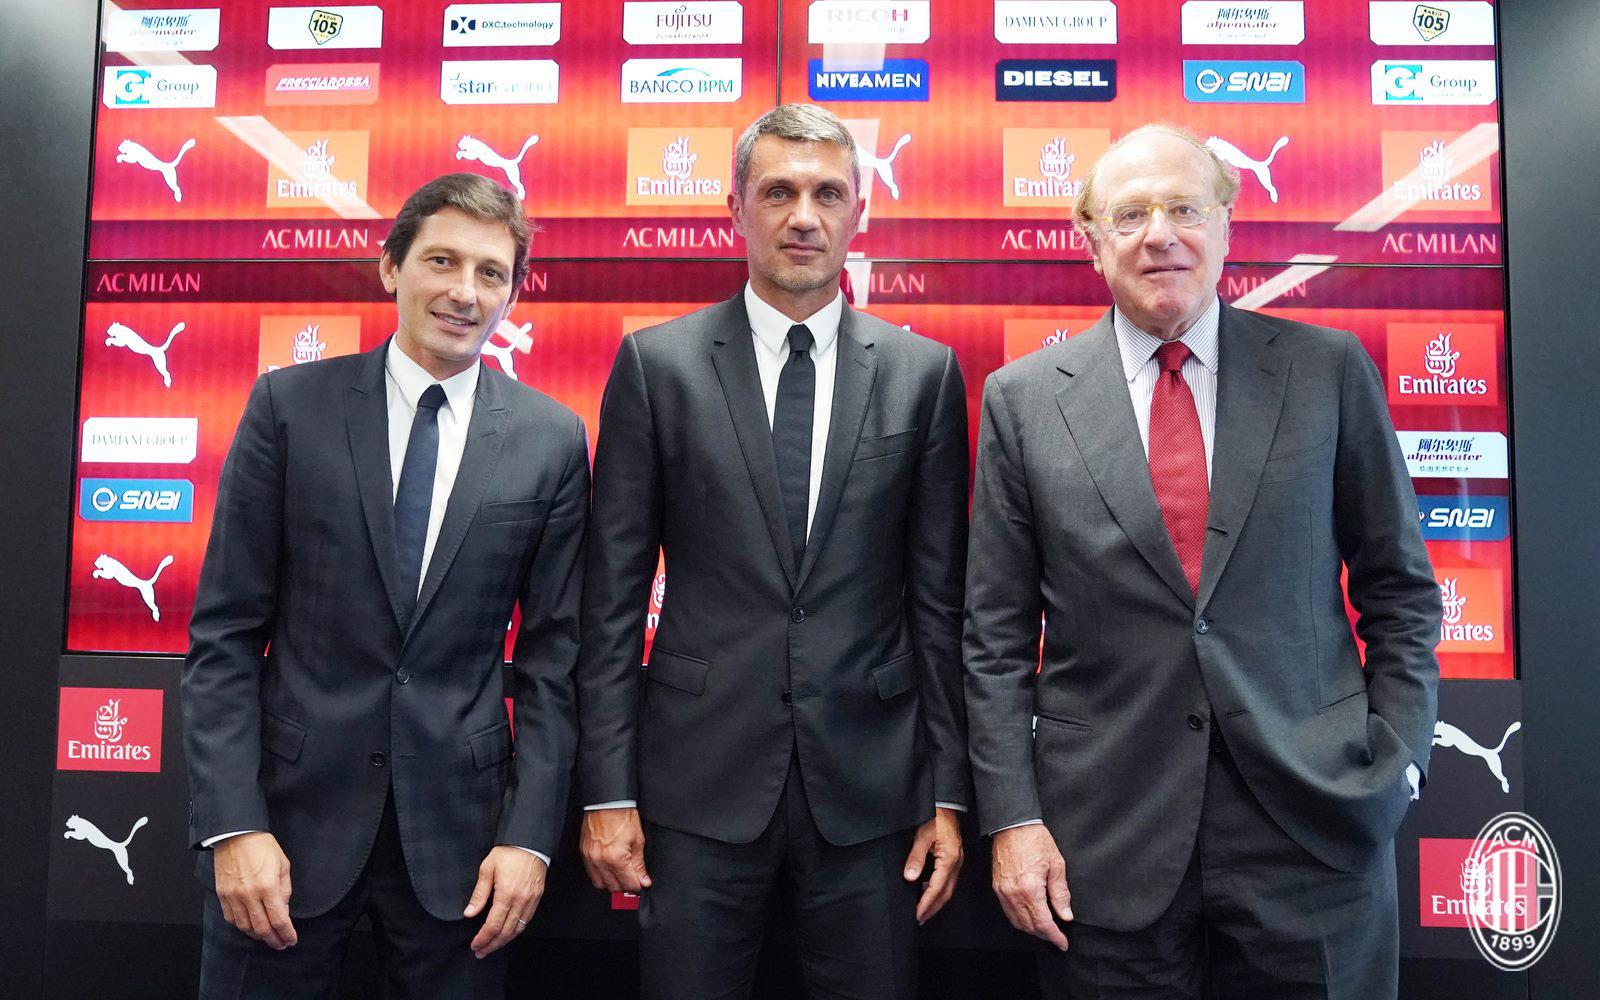 Leonardo, Paolo Maldini and Paolo Scaroni during Maldini's presentation at Casa Milan on August 6, 2018. (@acmilan.com)